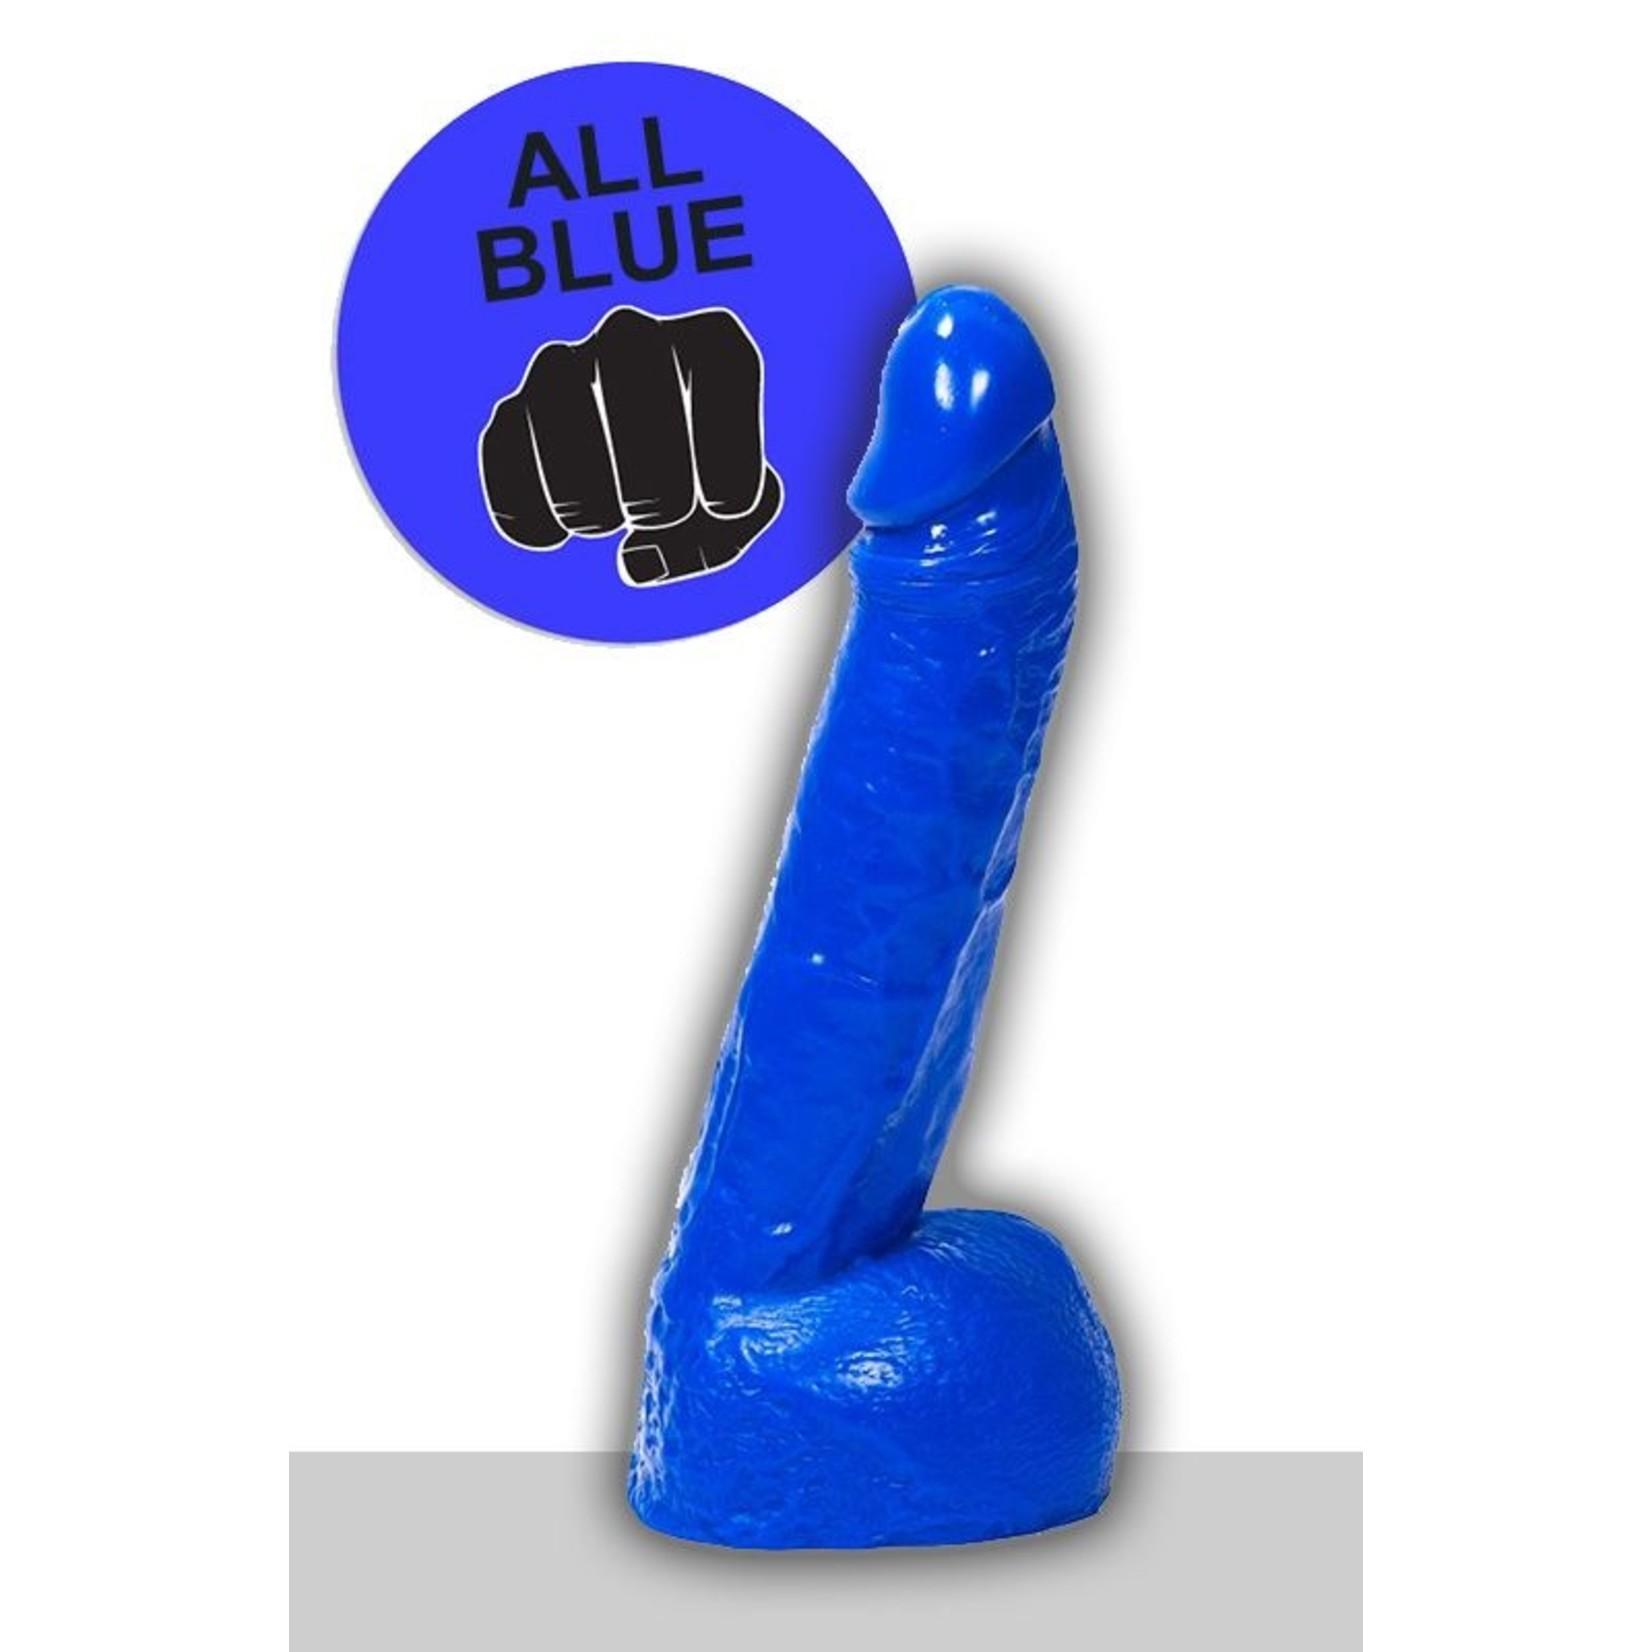 All Black All Blue Dildo - ABB 11